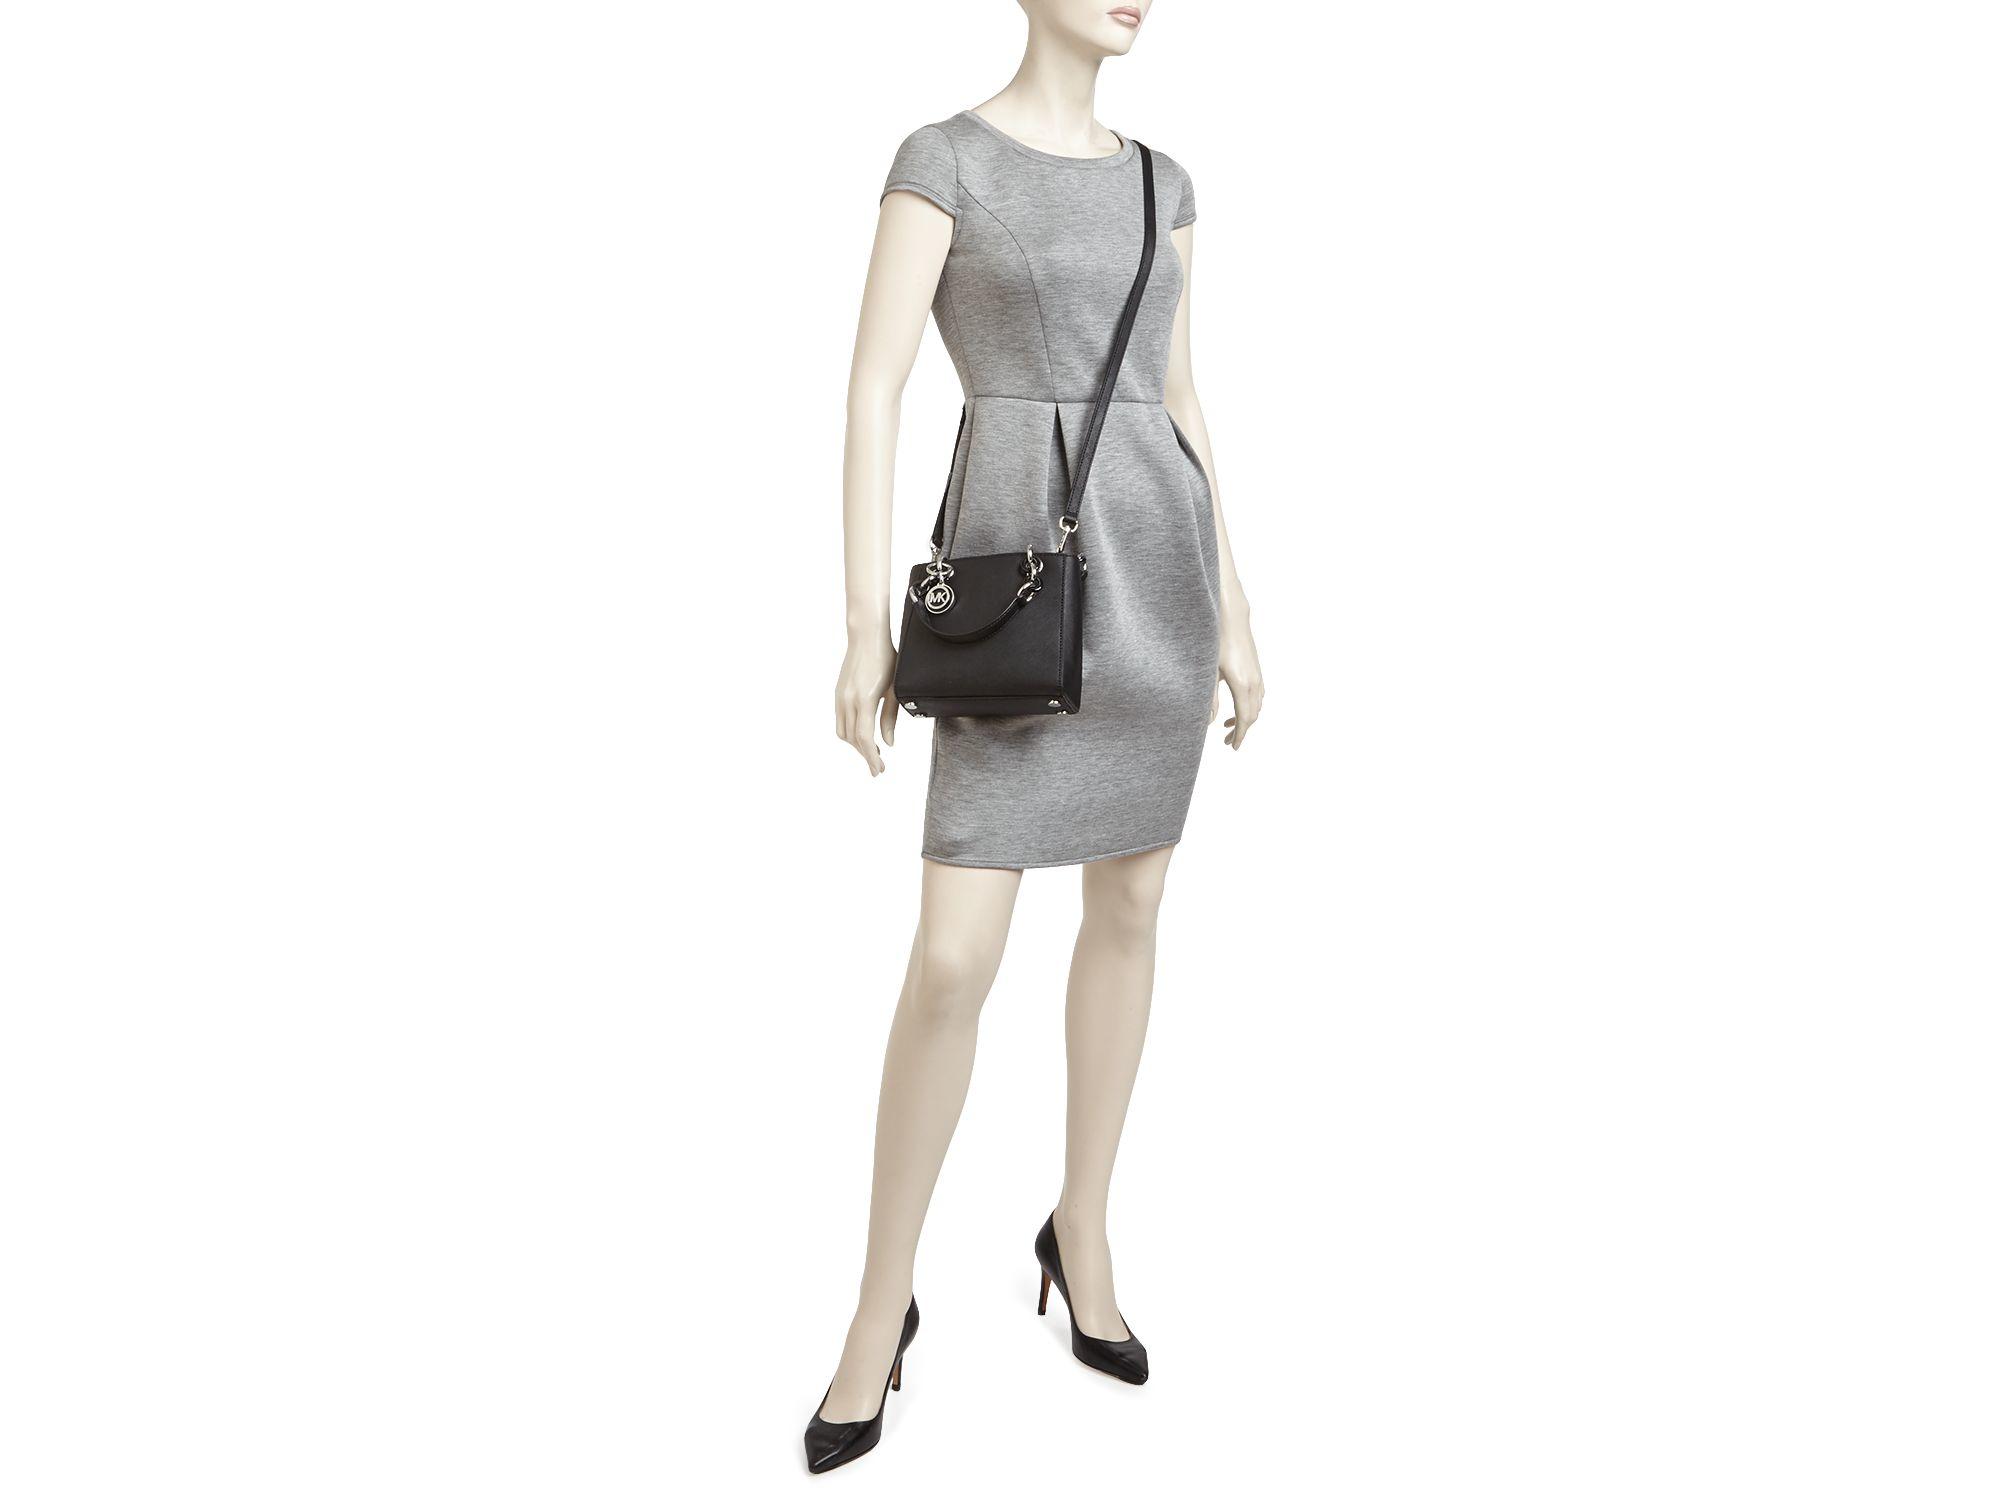 michael kors cynthia small shoulder bag equilibrium. Black Bedroom Furniture Sets. Home Design Ideas